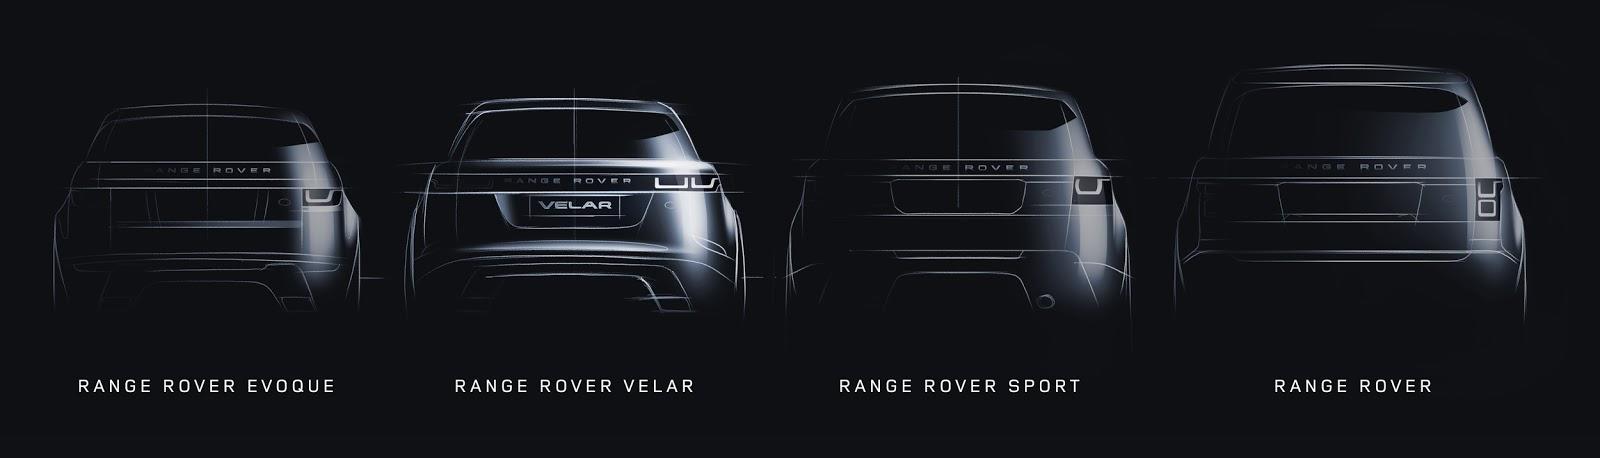 Range Rover Velar nằm giữa phân khúc Evoque và Range Rover Sport